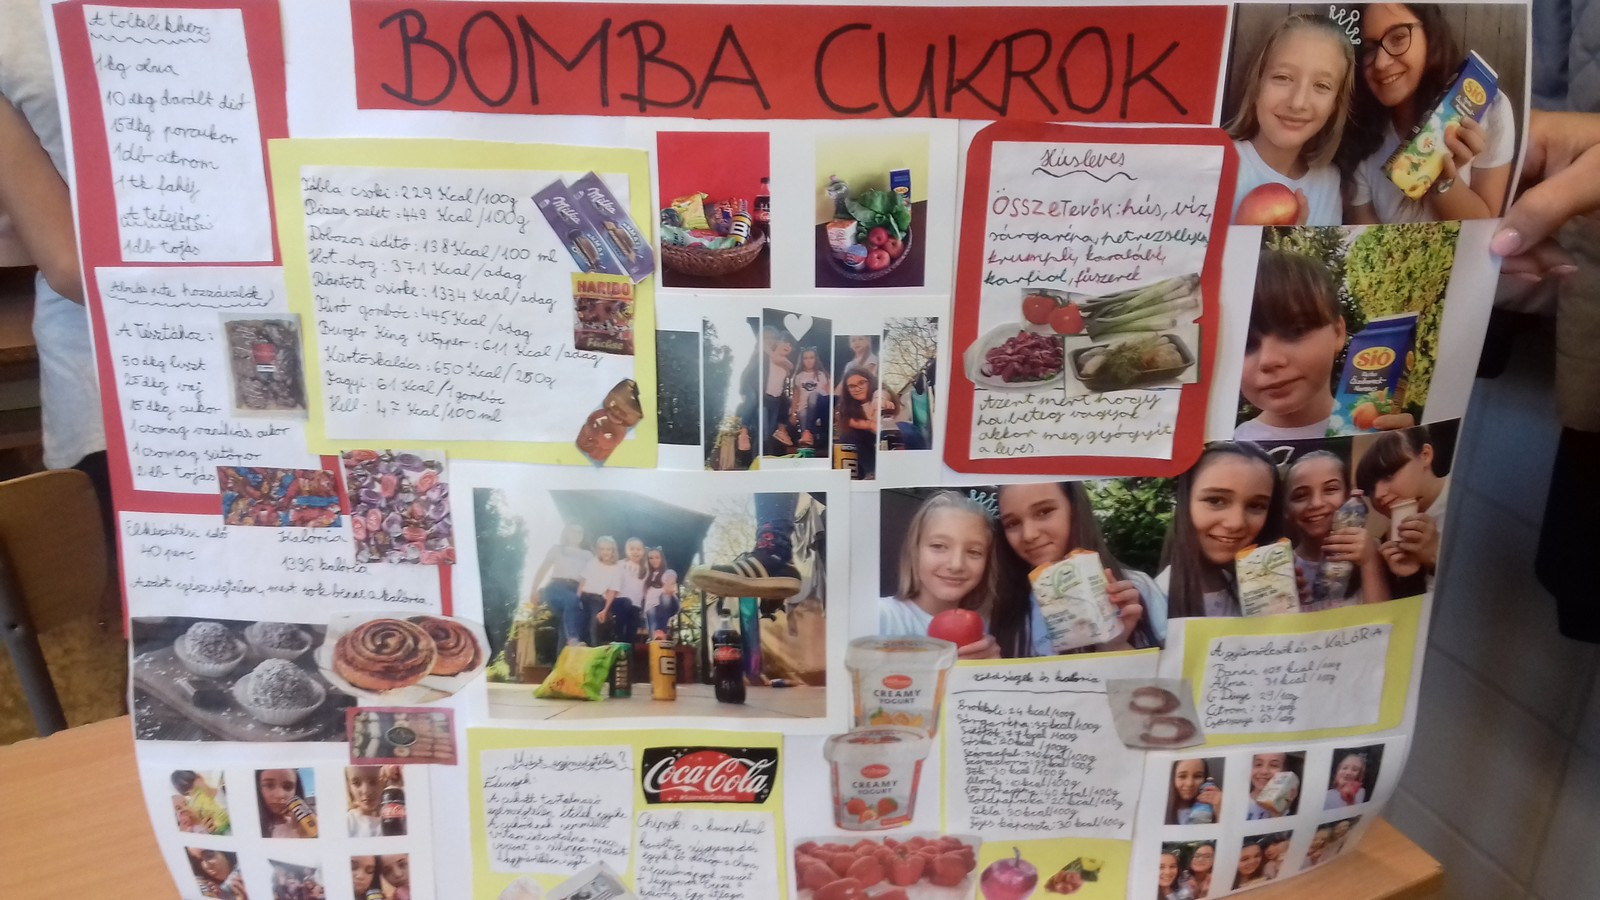 5/b Bomba cukrok